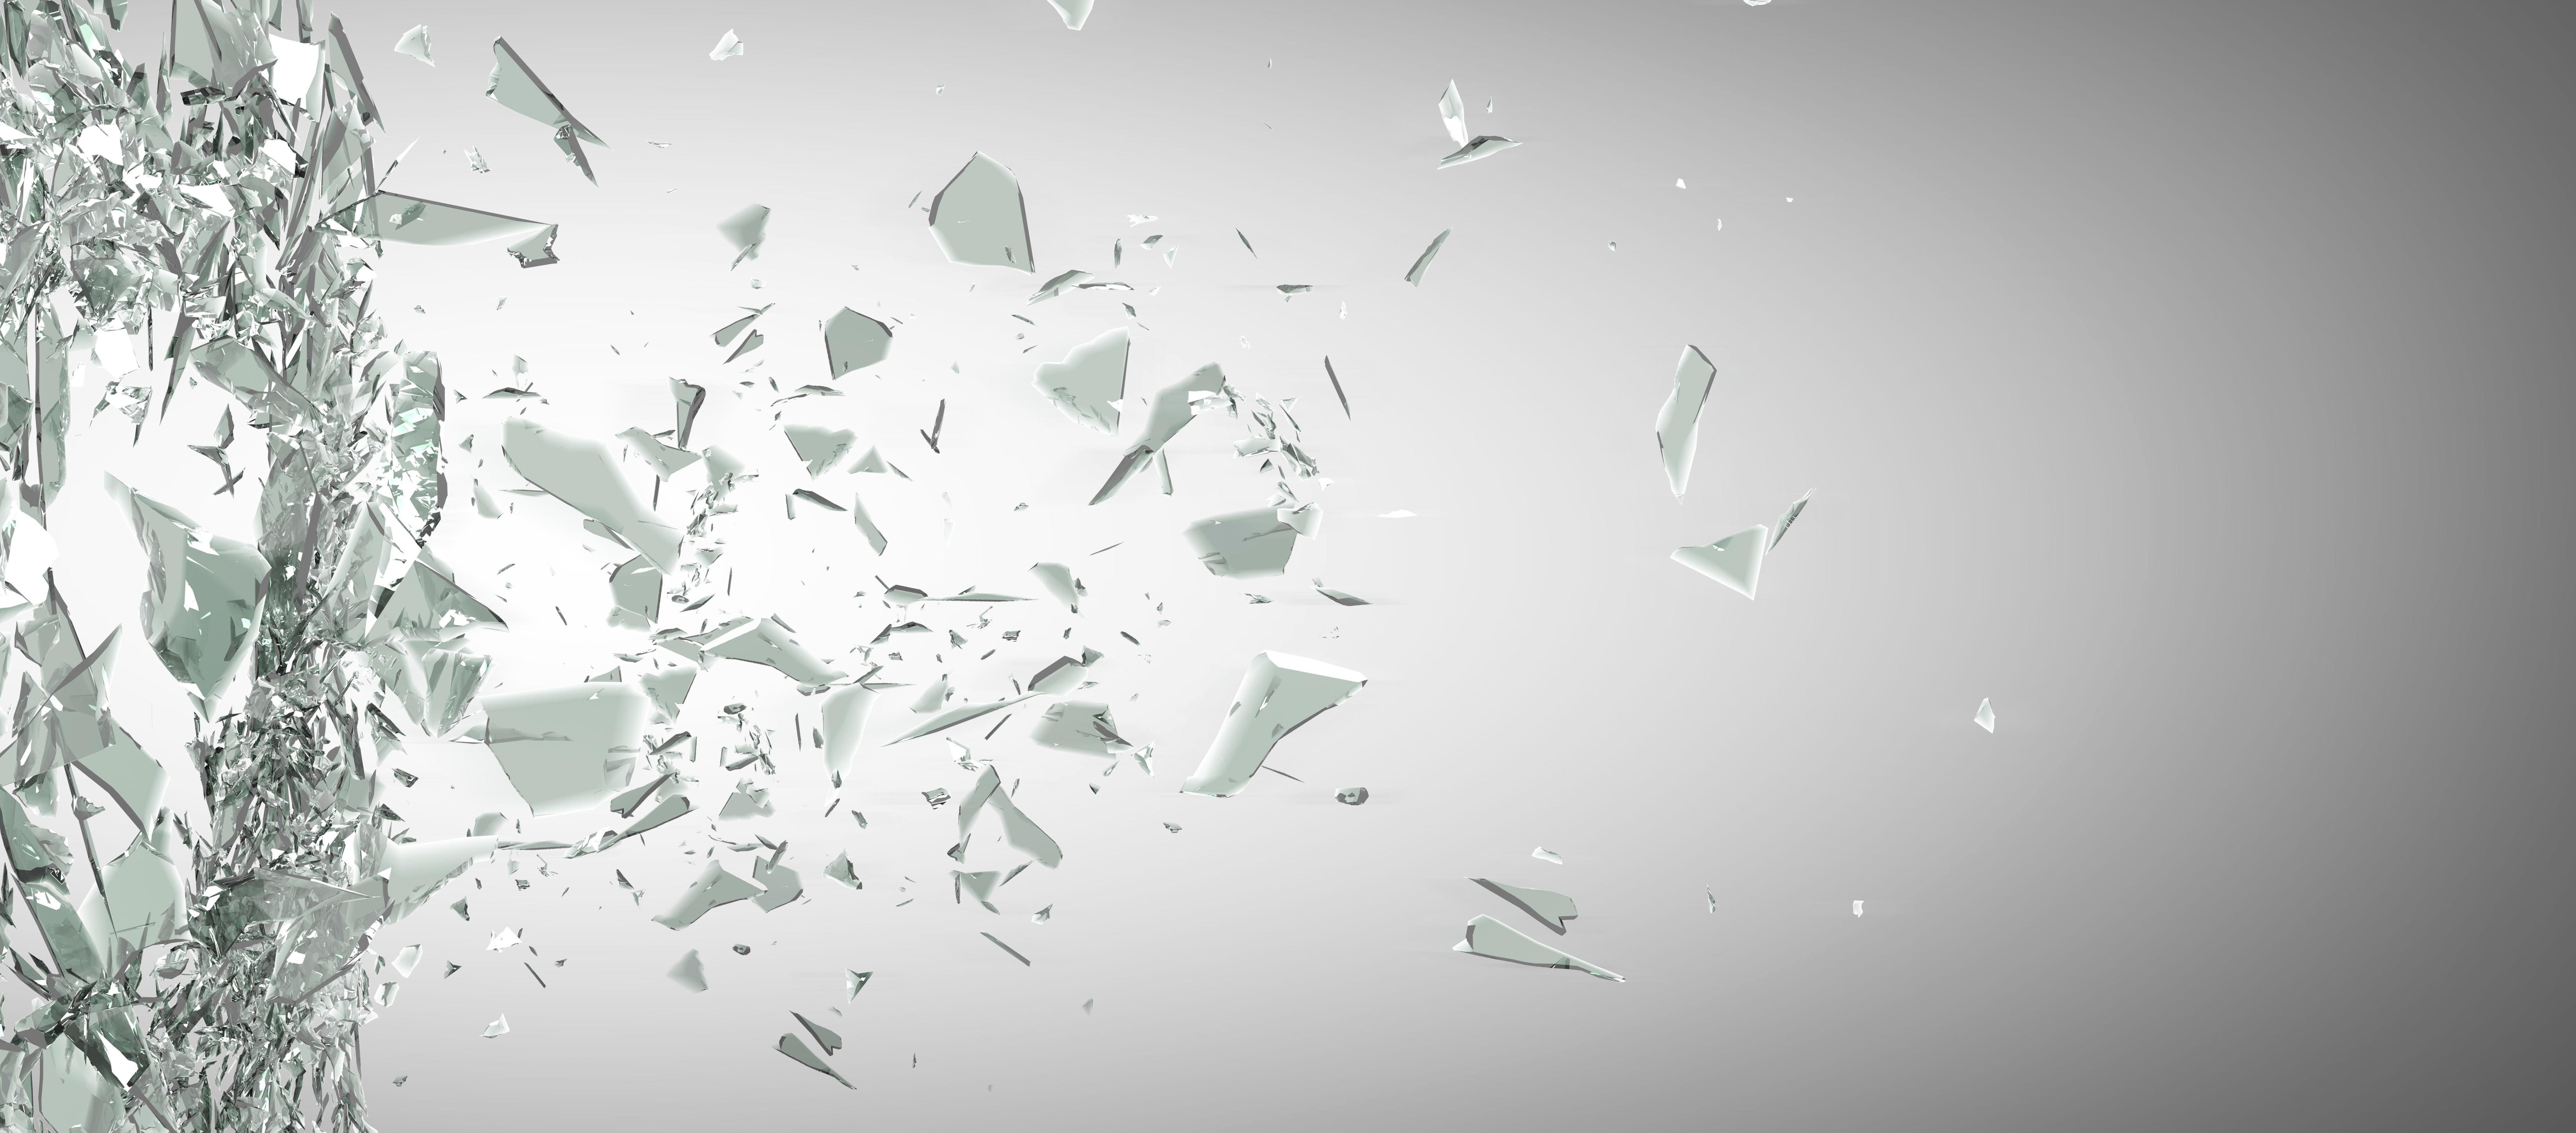 brokenstockphoto.jpg